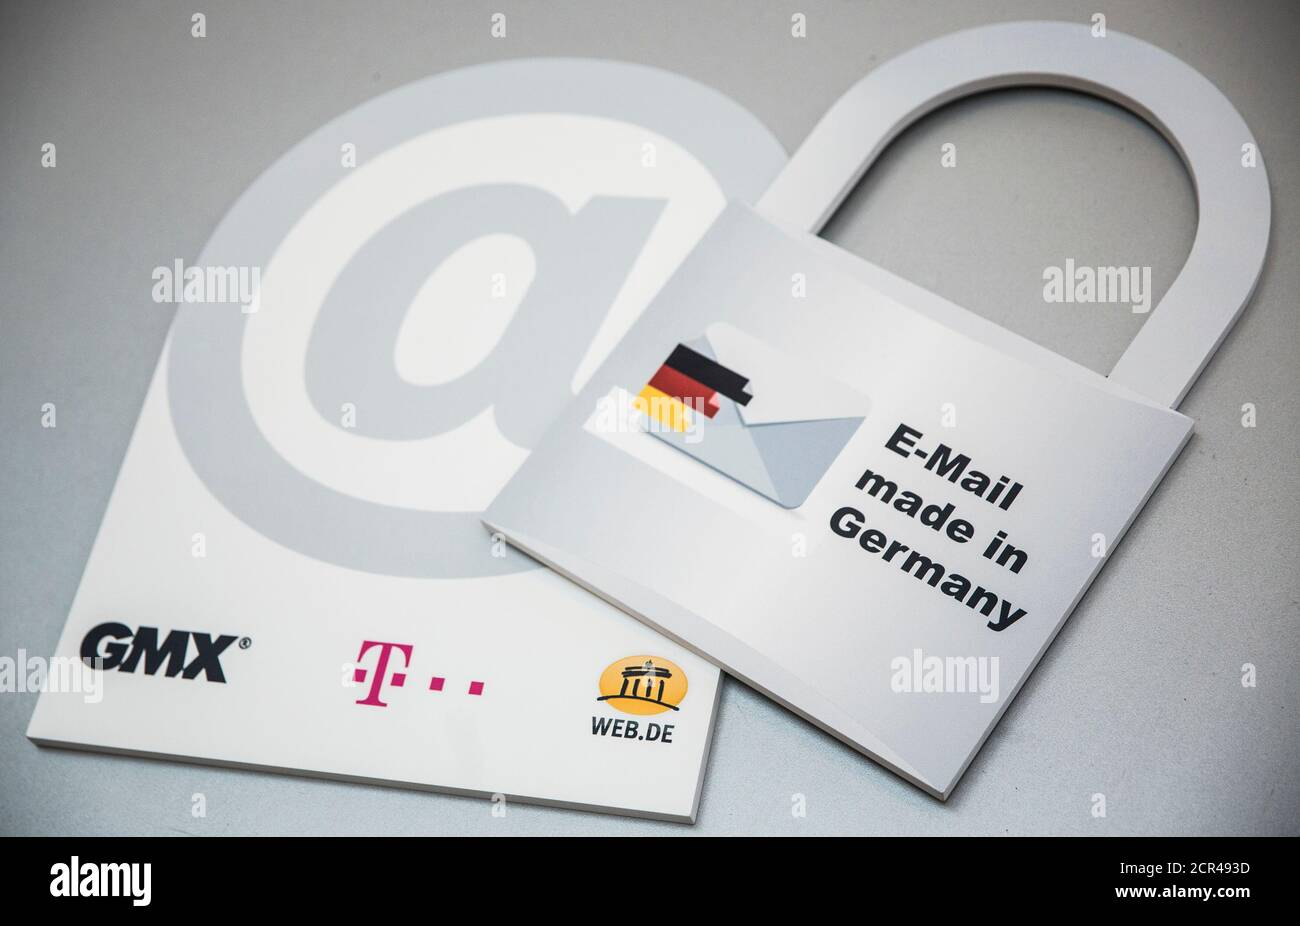 Telekom email login deutsche Deutsche Telekom's